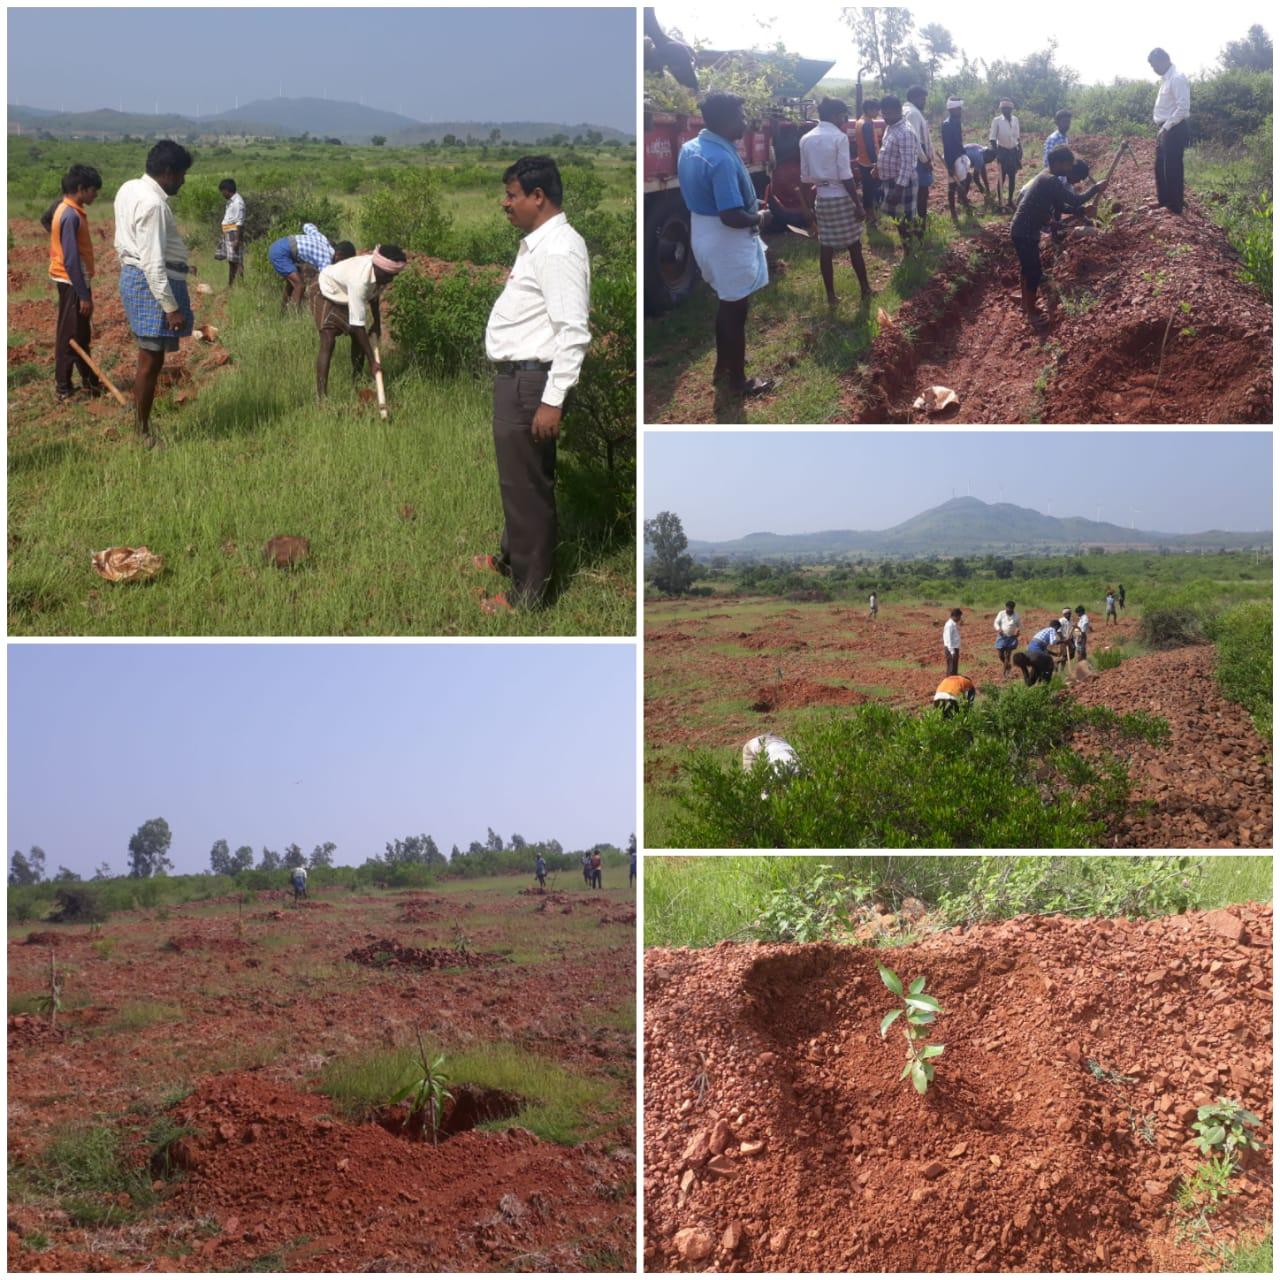 /media/speech/1NGO-00056-SPEECH-Activities-Plantation_Field_Work.jpeg